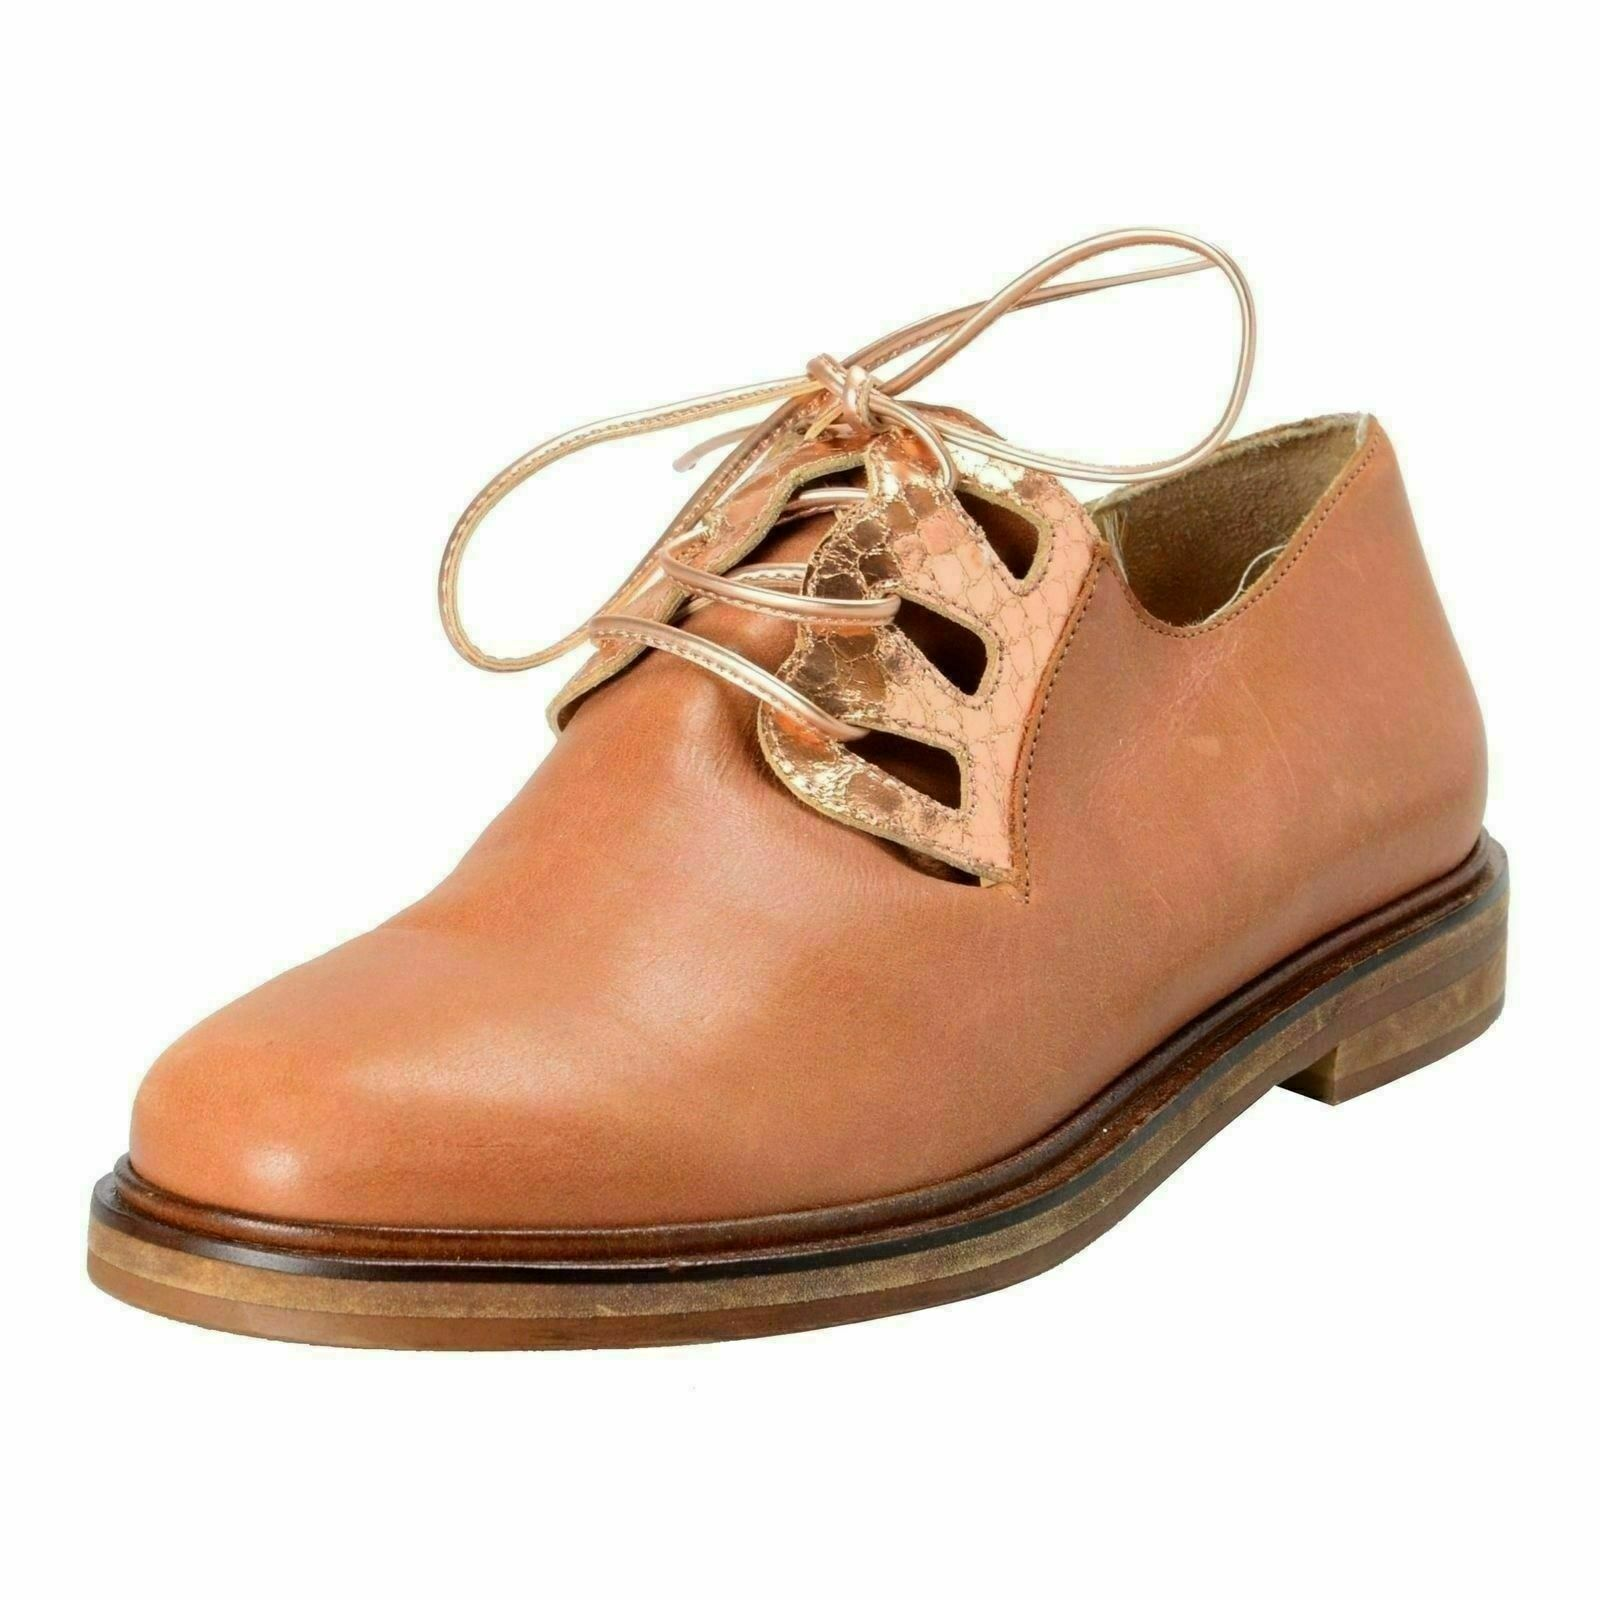 Maison Margiela Mm6 Damen Antikleder Oxford Schuh Flache Schuhe Us 6 It 37